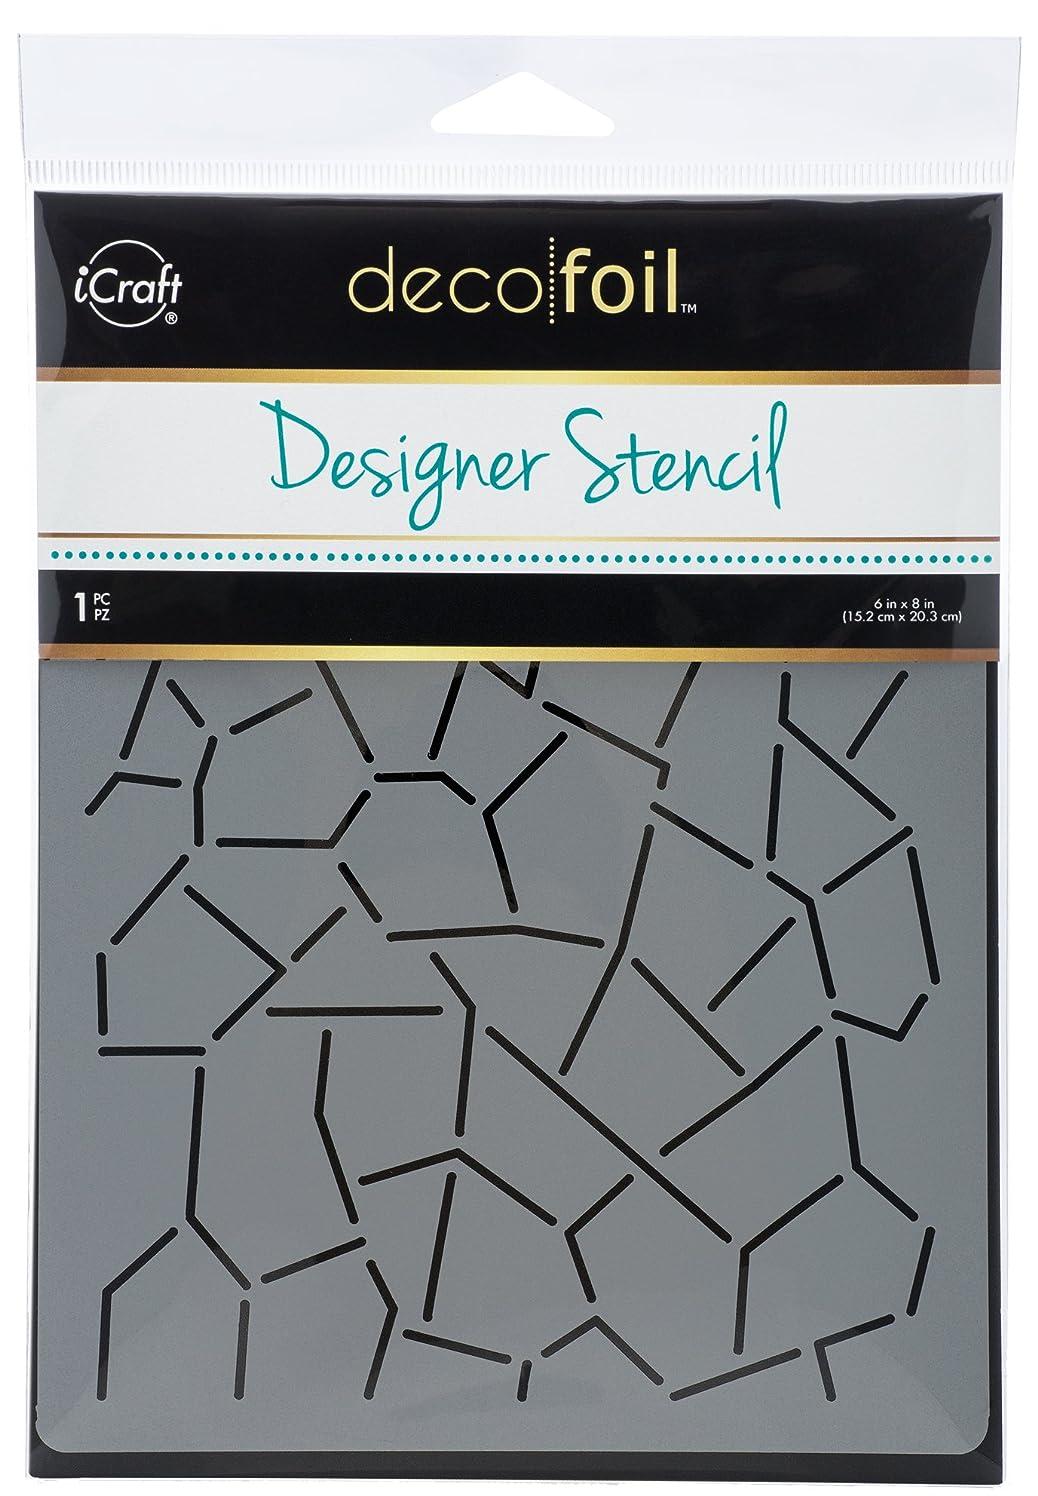 iCraft Deco Foil 5505 Designer Stencil 6x8 Crackle None